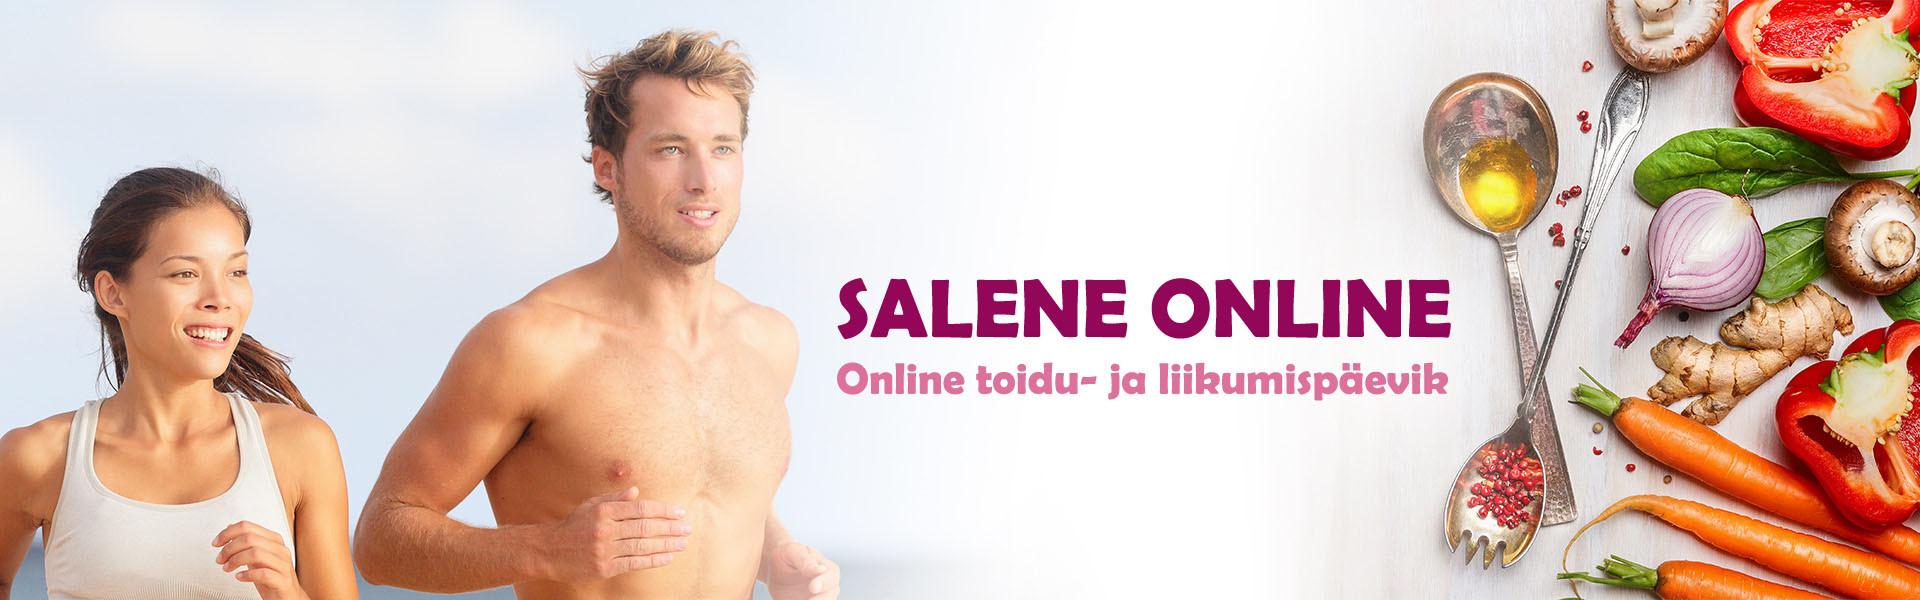 Salene Online